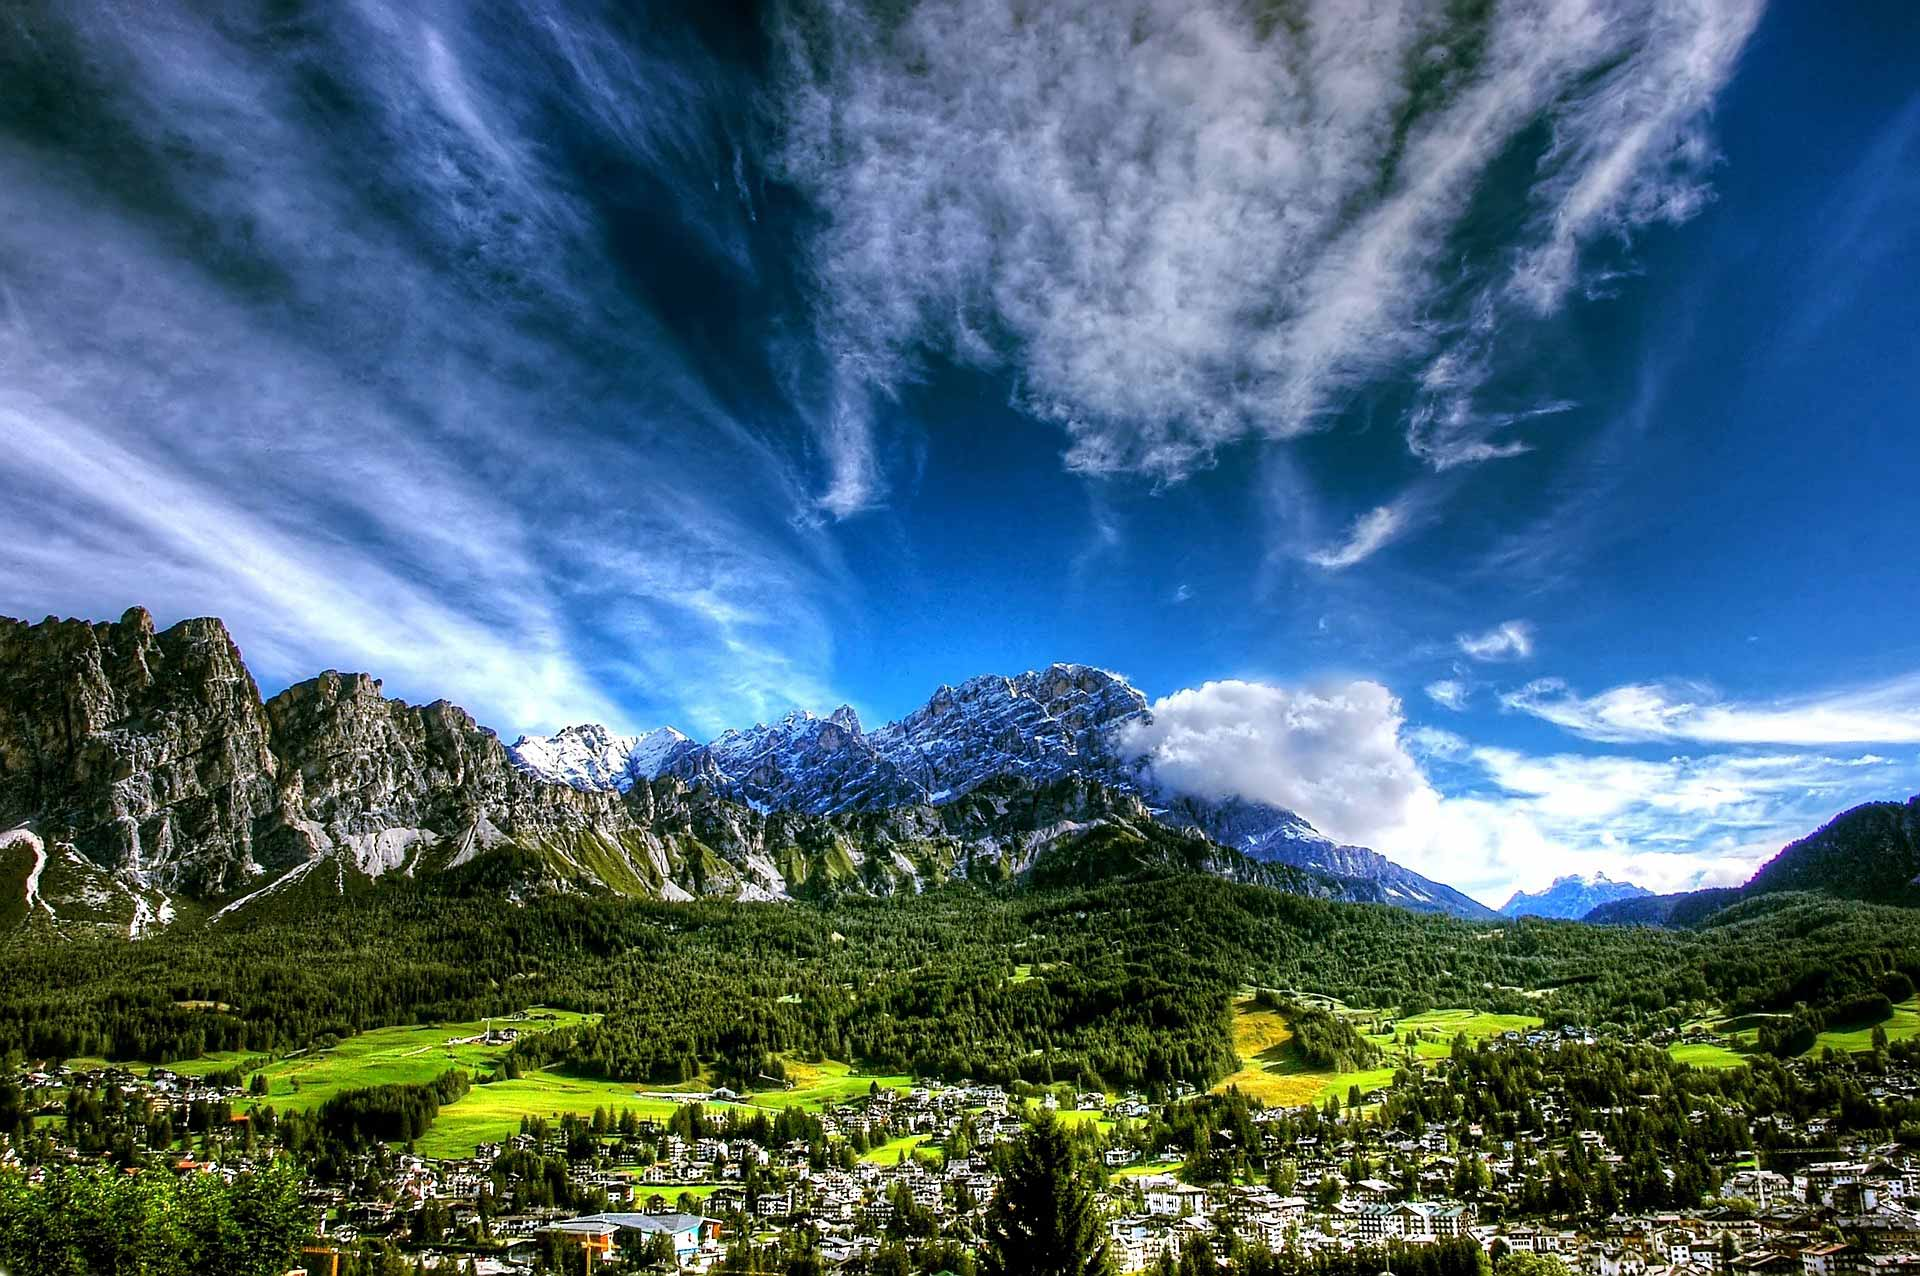 Cortina-d'Ampezzo Chalet Lago Antorno - 2198259_1920